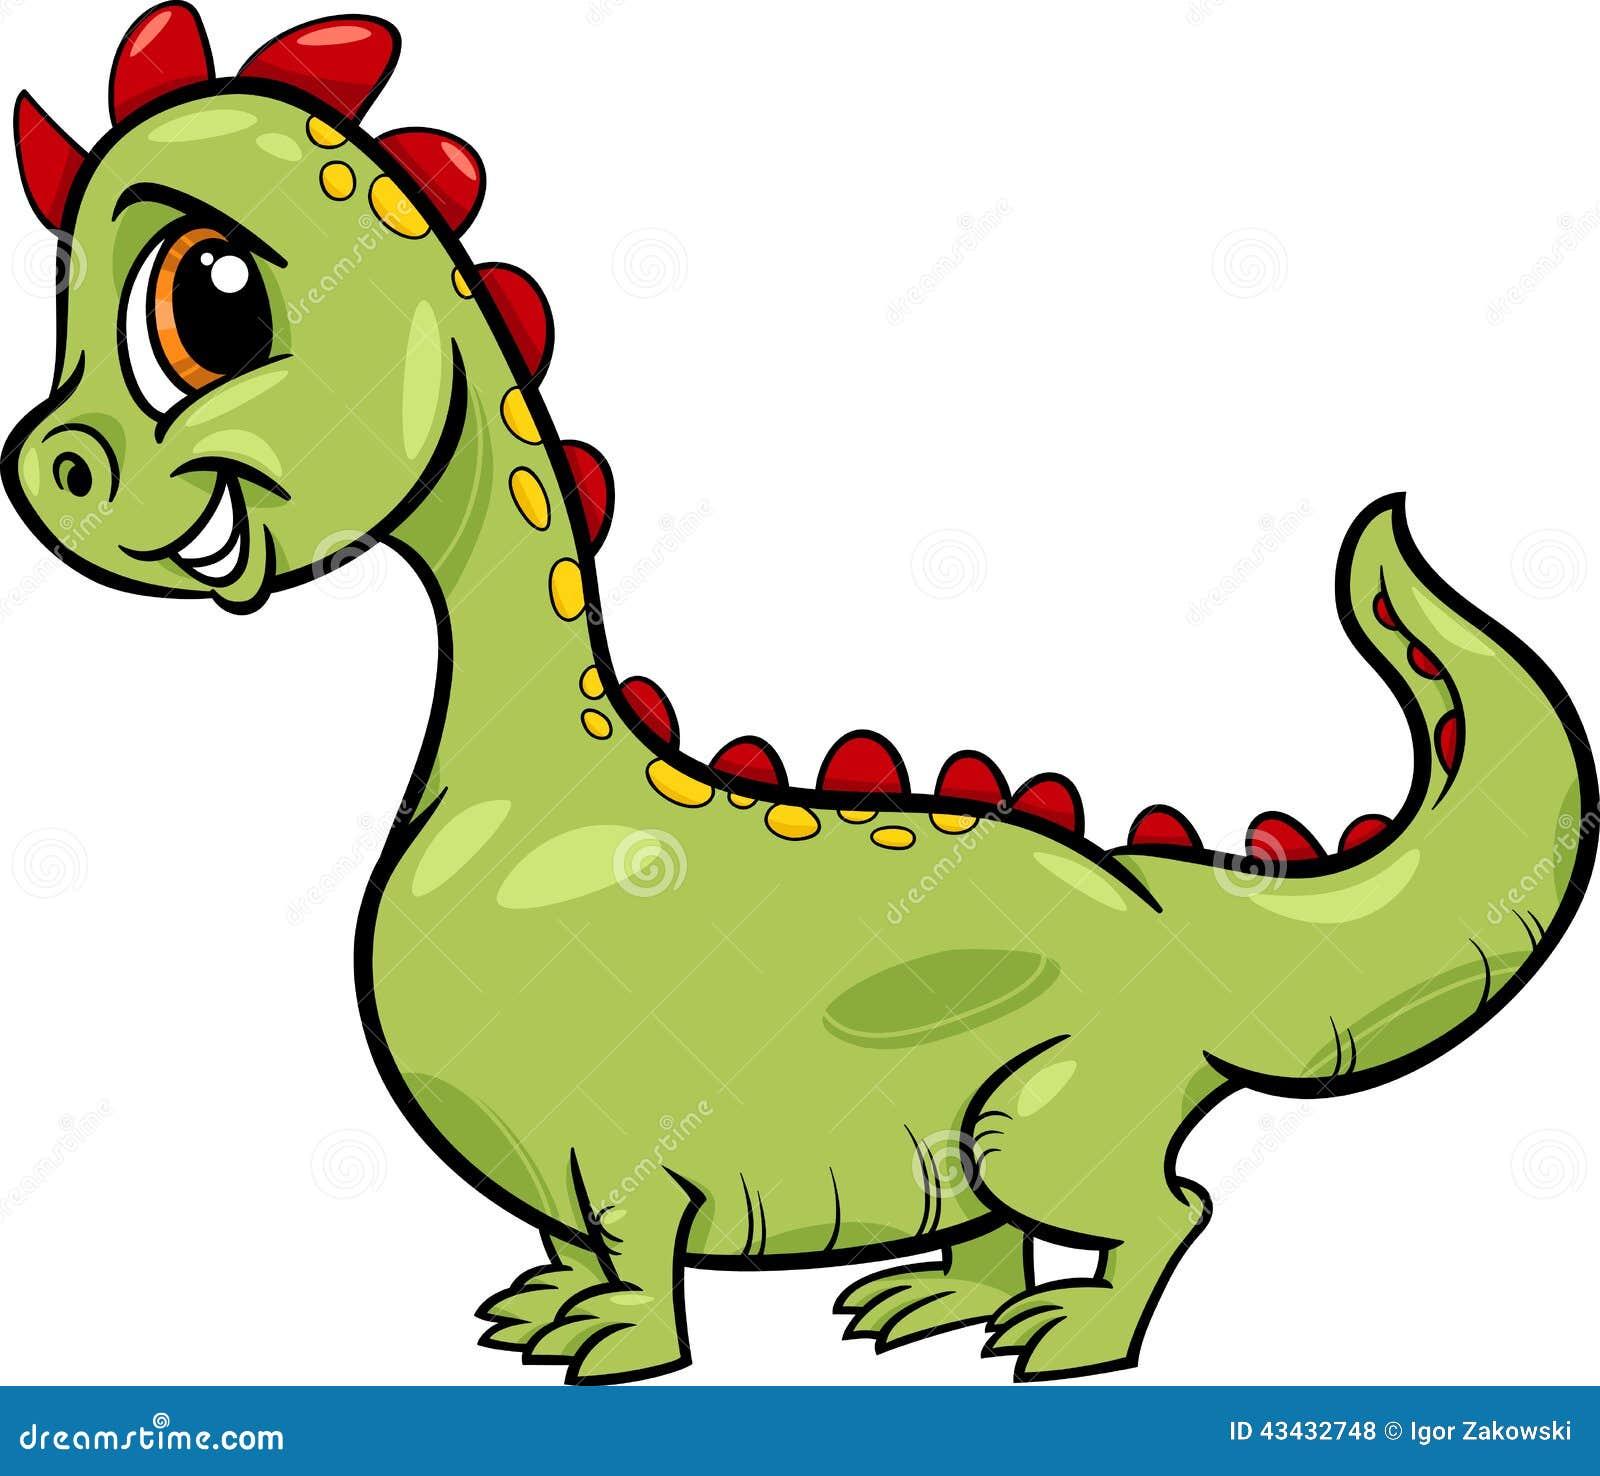 cartoon dragon cute fantasy character stock vector illustration of